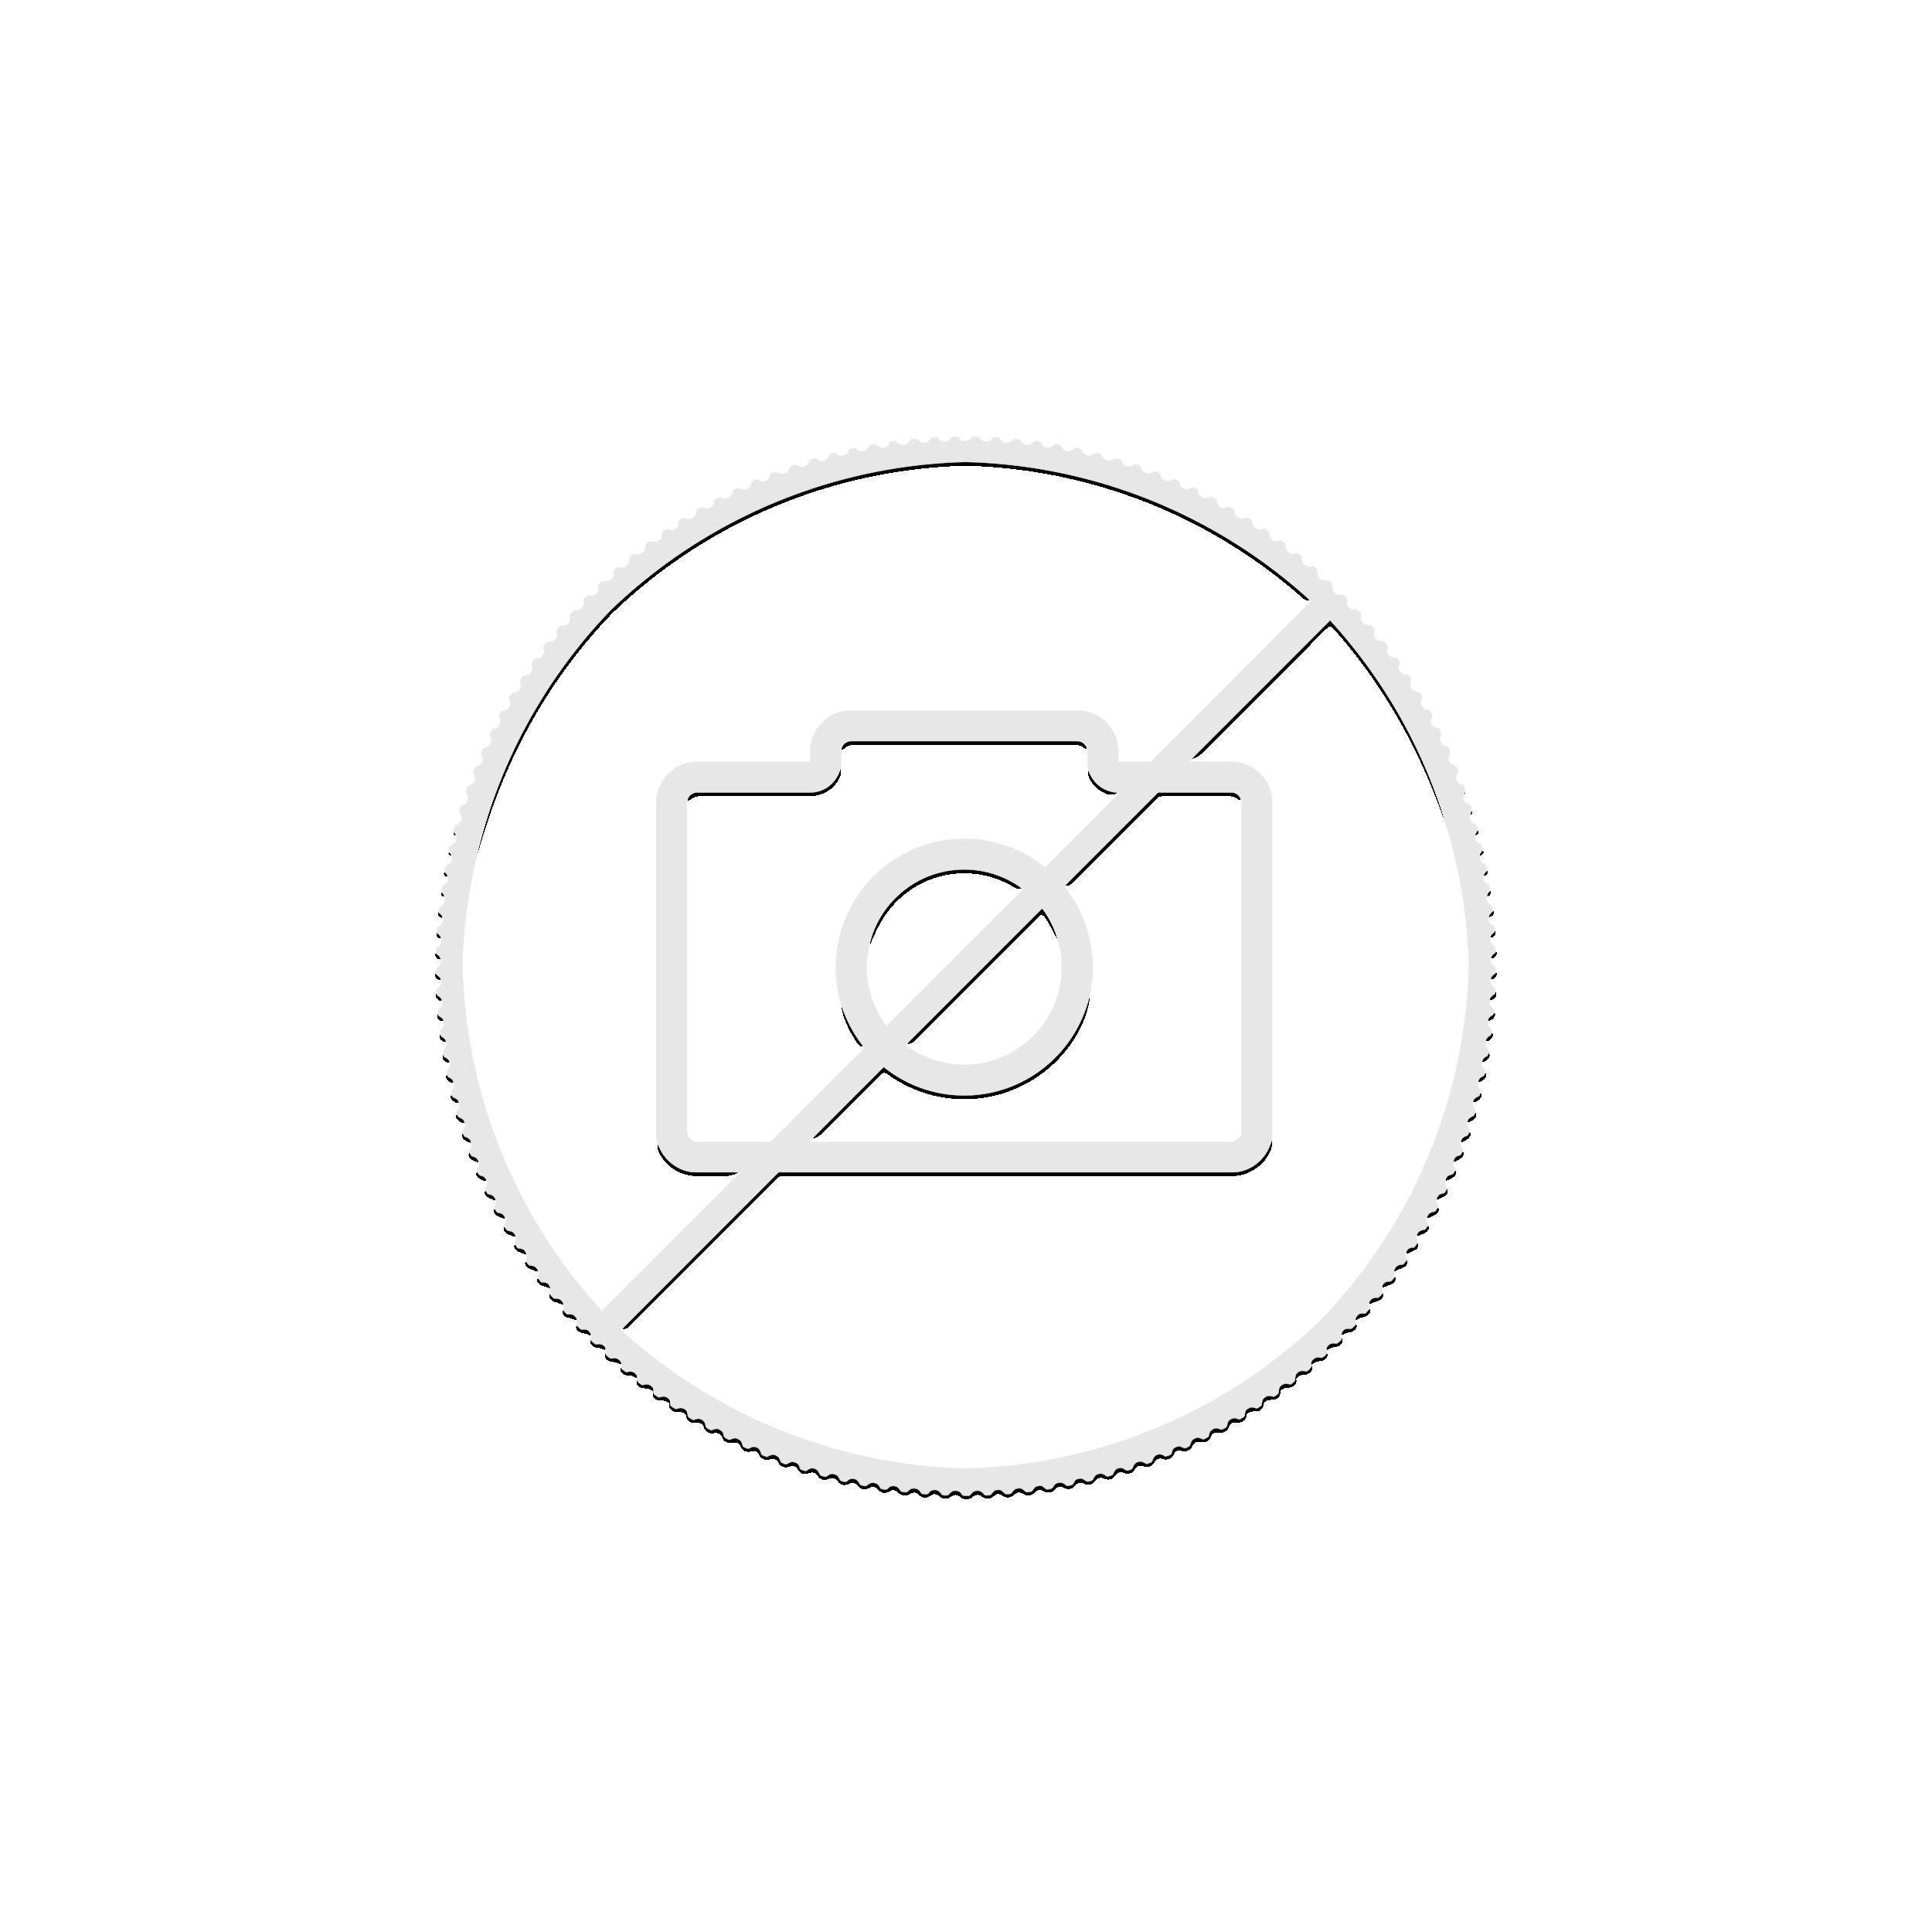 1 troy ounce gouden American Buffalo munt 2019